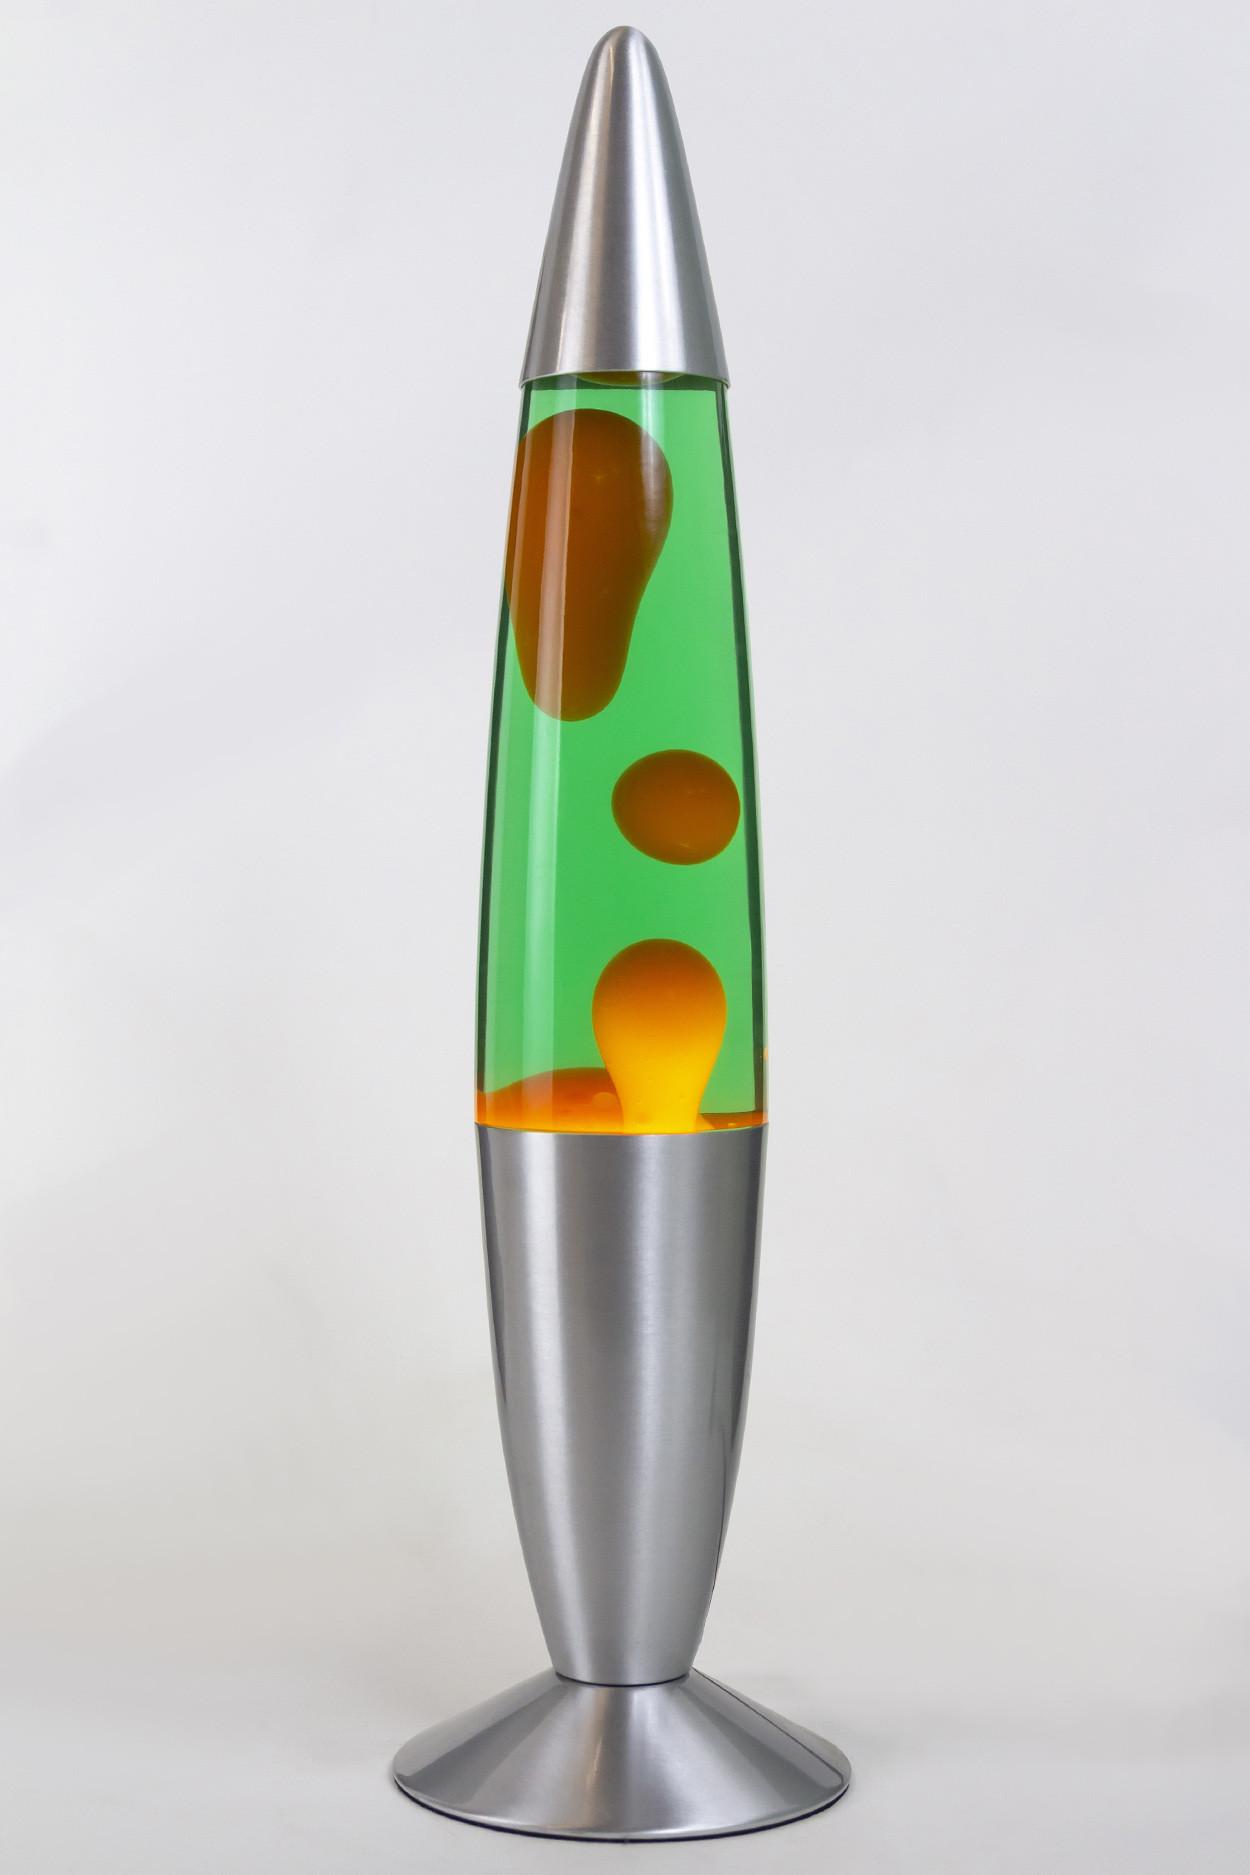 Лава-лампа 48см Оранжевая/Зелёная (Воск)